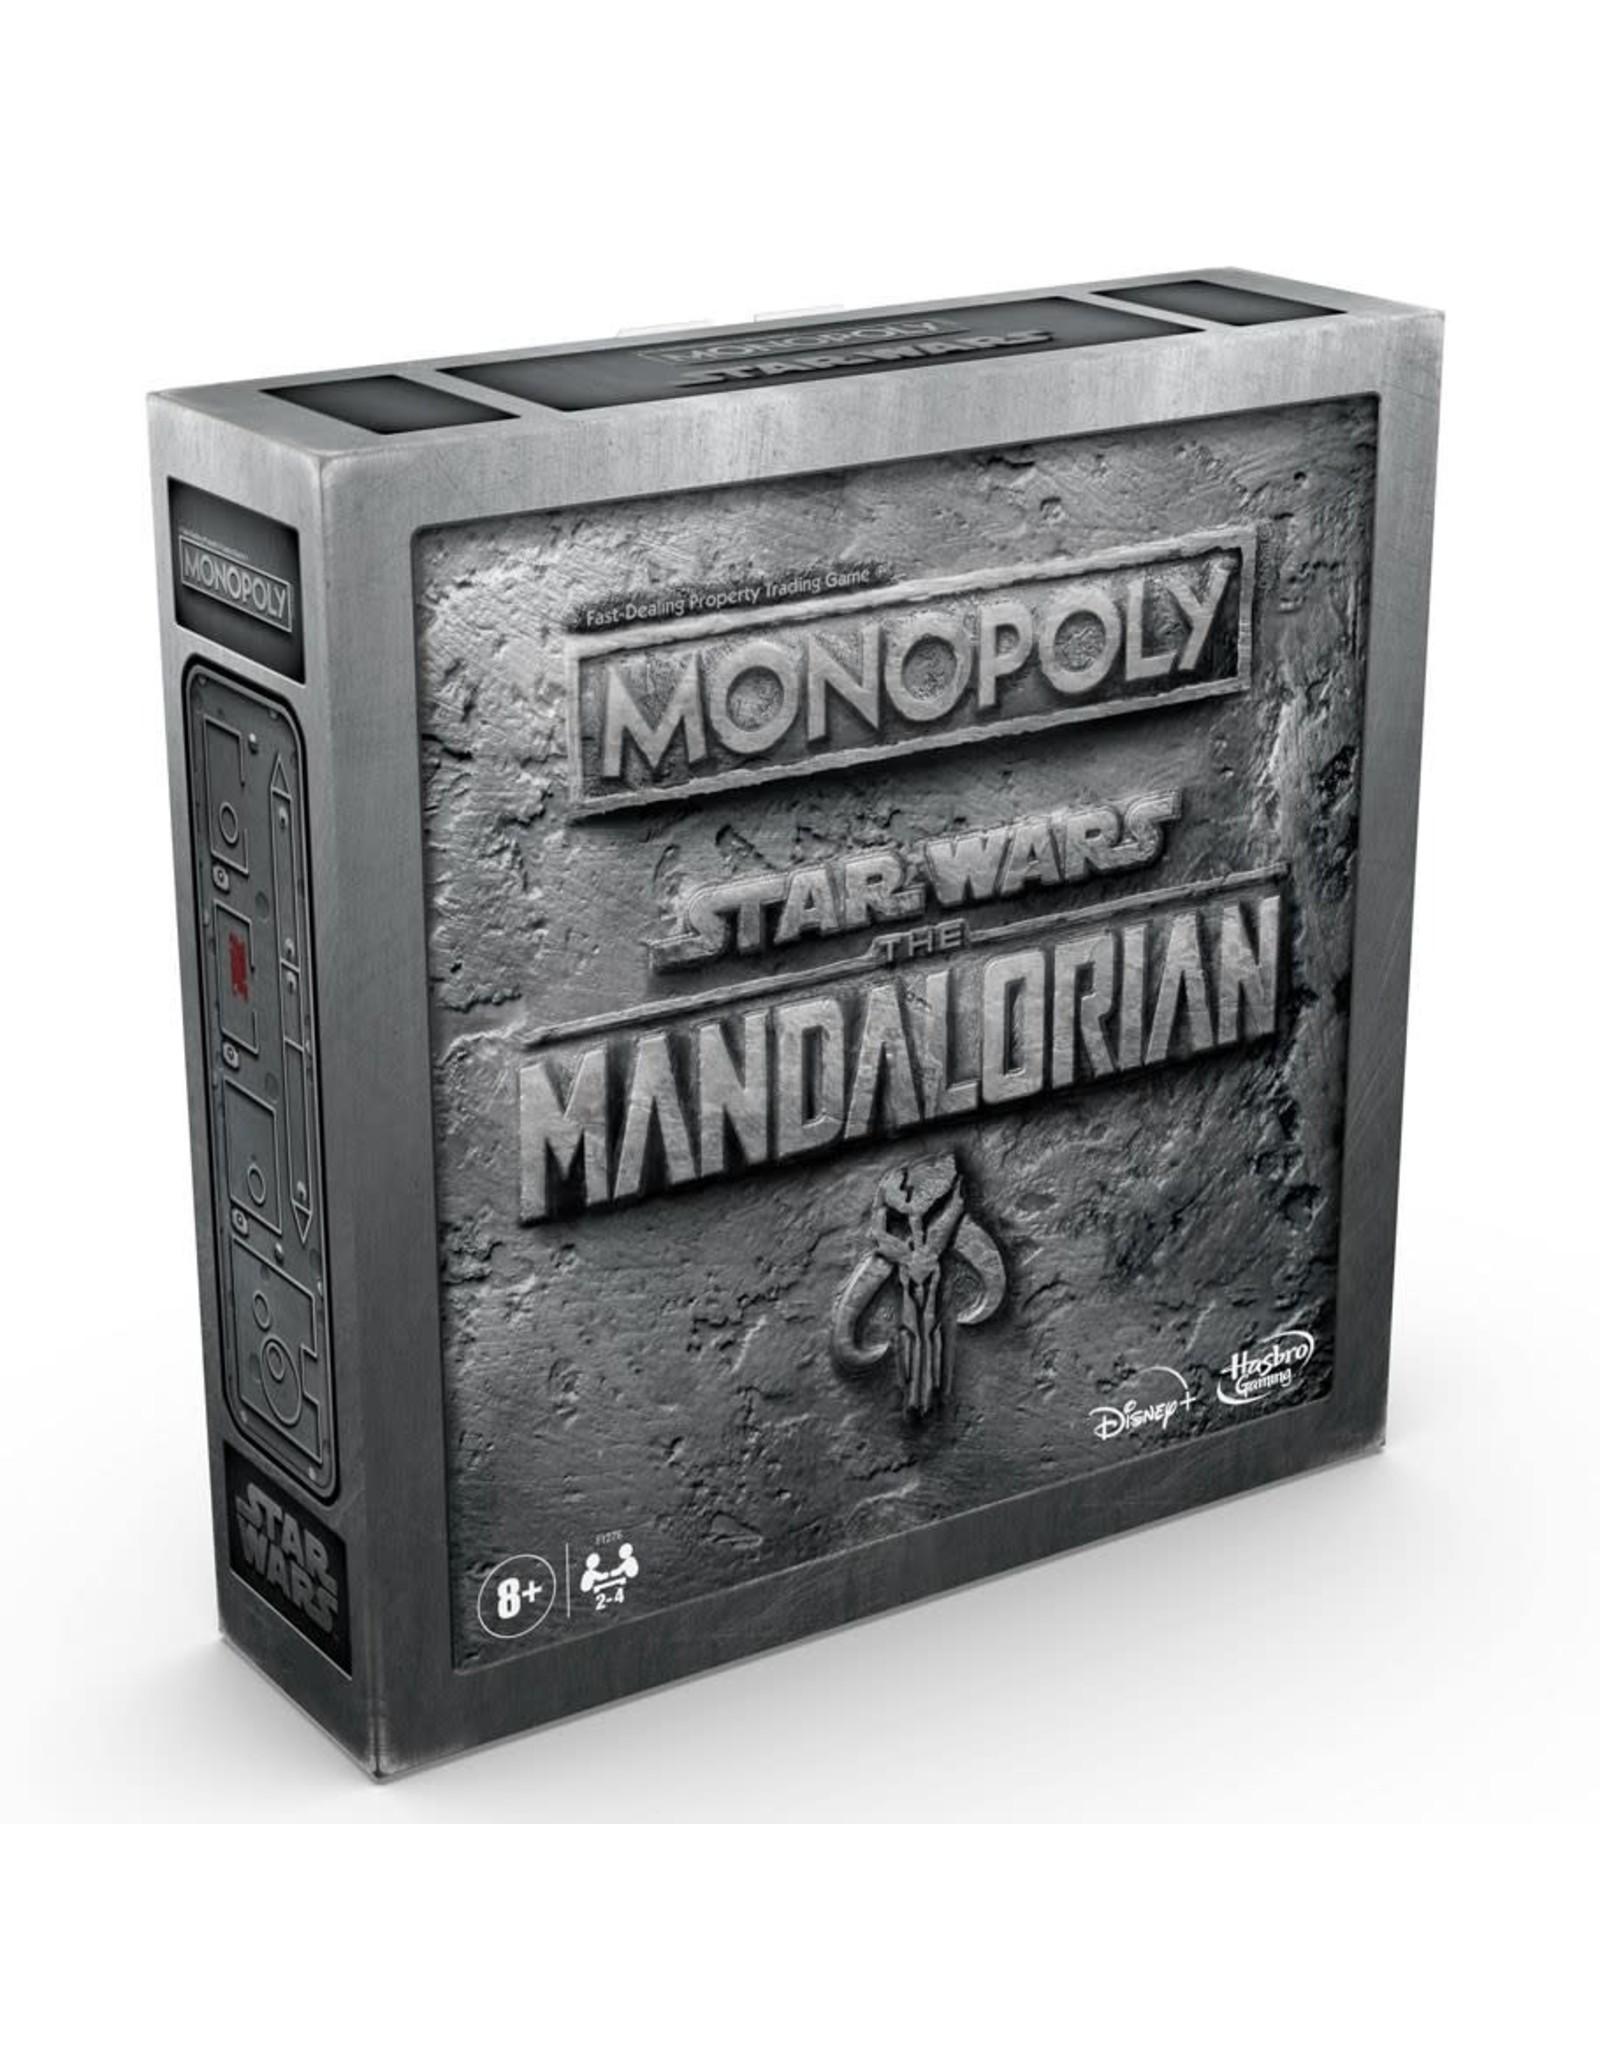 Monopoly: Star Wars: The Mandalorian